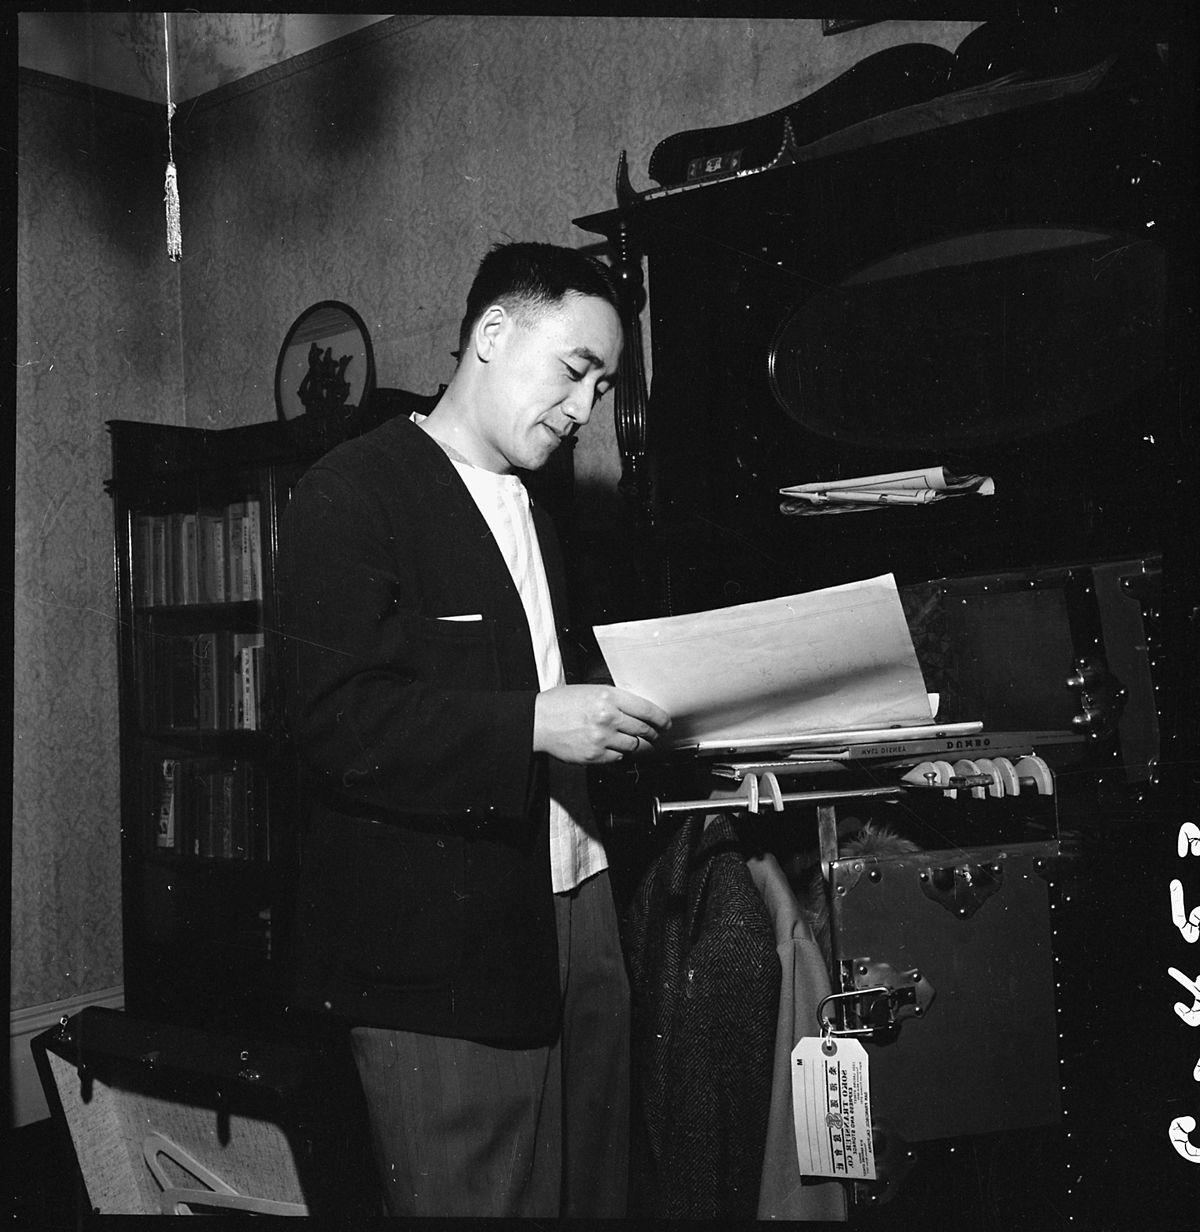 Dave Tatsuno - Wikidata